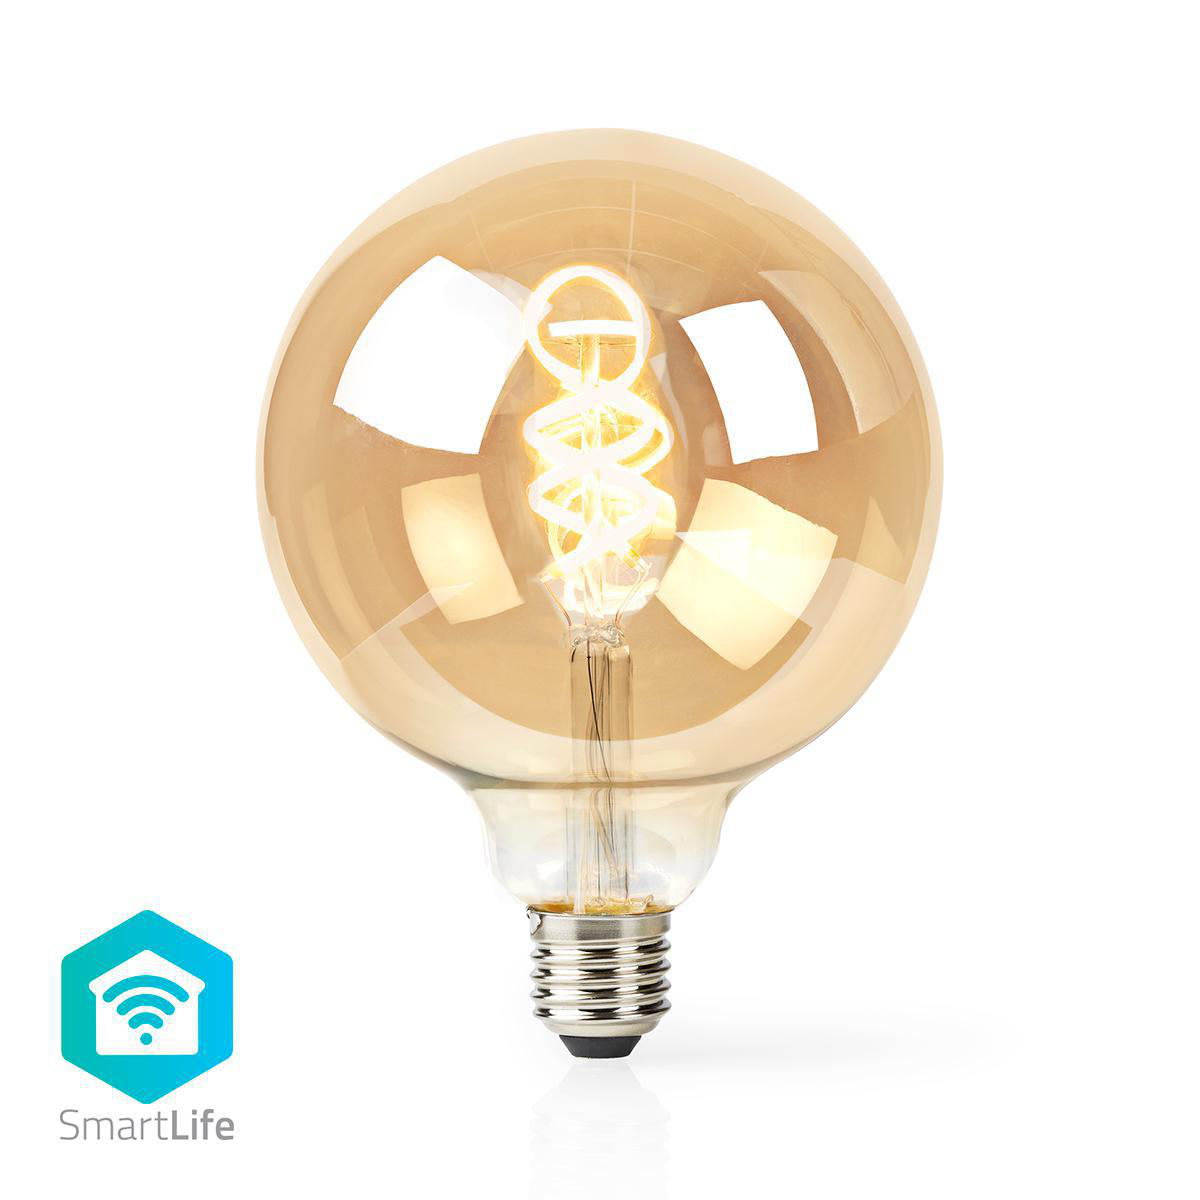 Globe spiraal lamp G125 - 125mm - LED slimme lamp - Amber - dimbaar - app besturing - filament